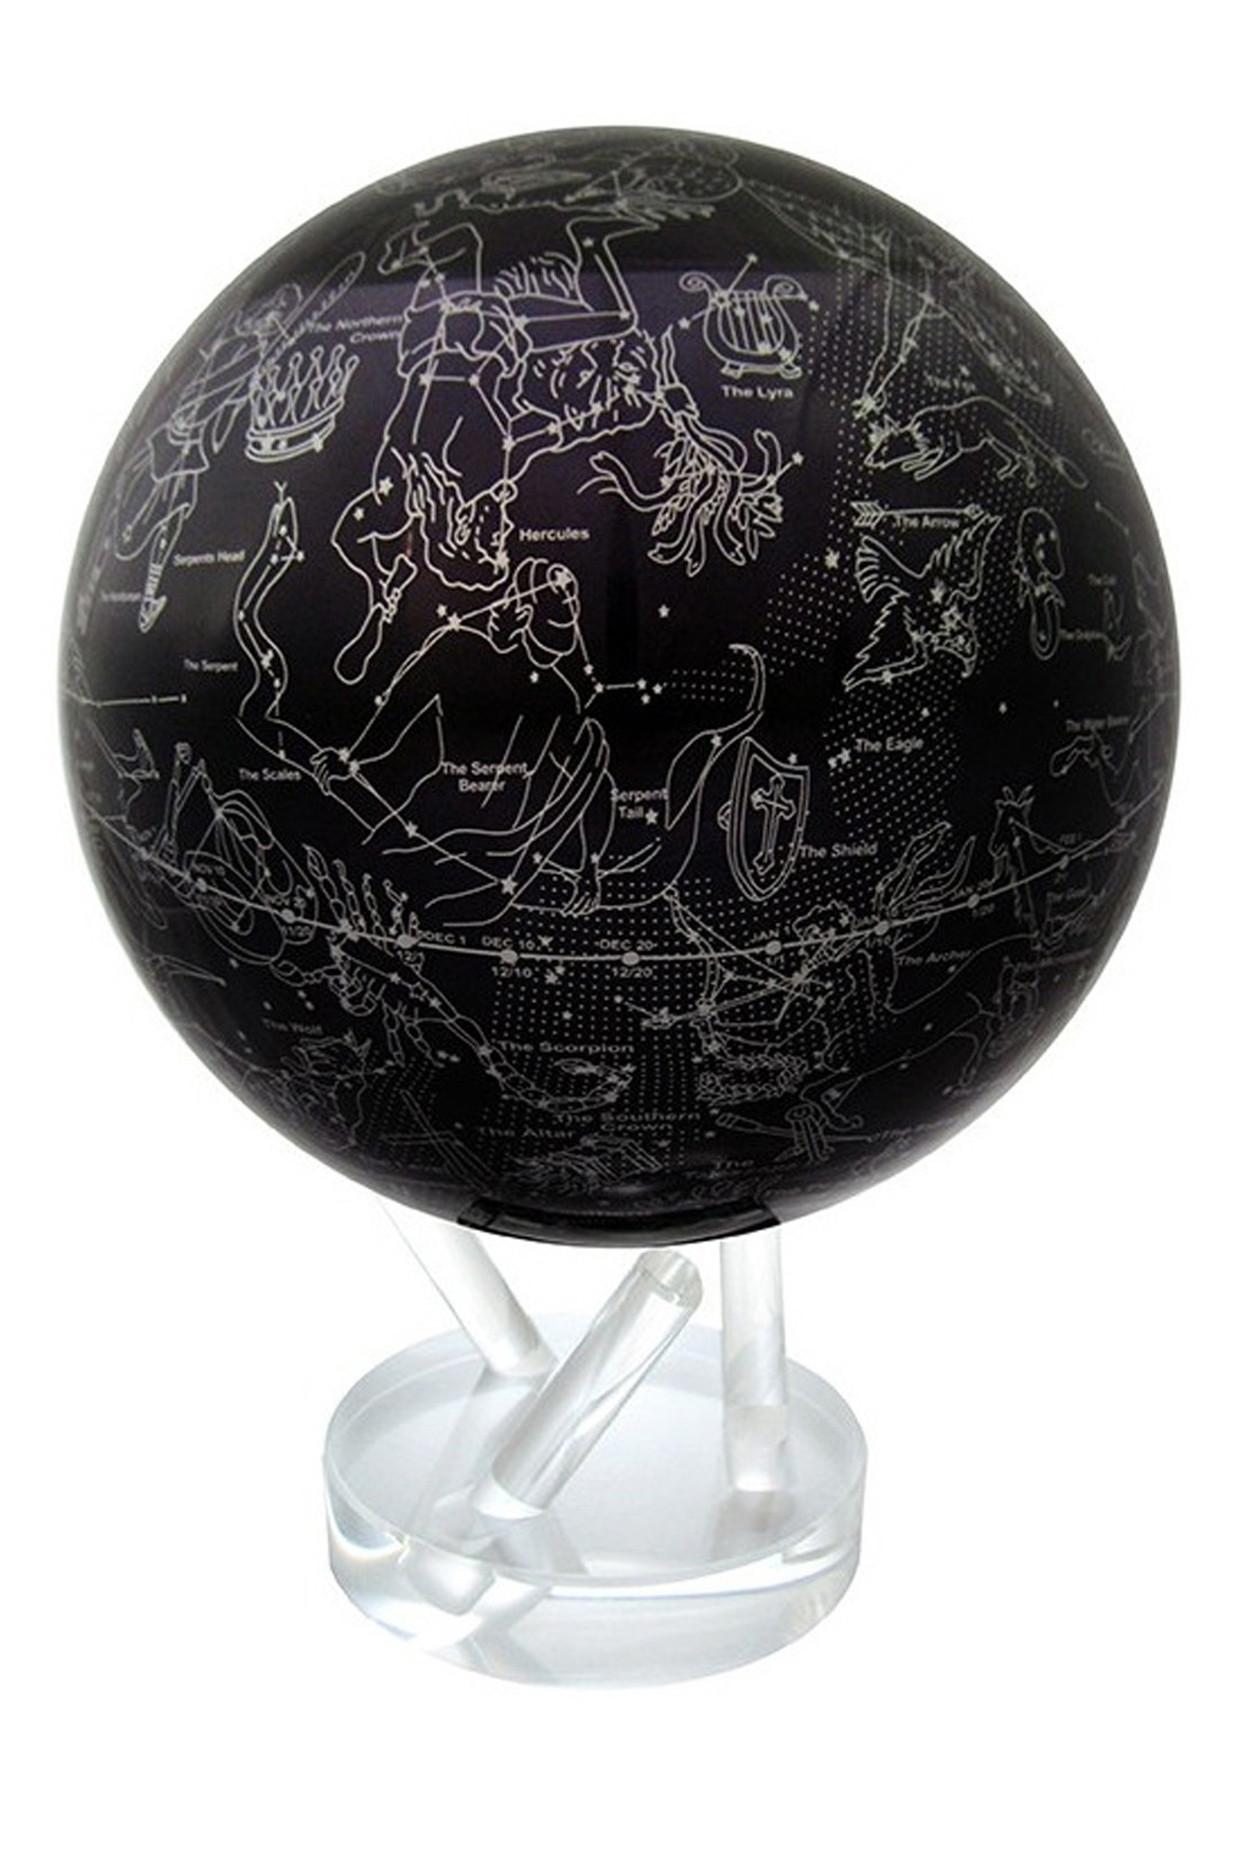 Глобус самовращающийся MOVA GLOBE d22 см  ЗВЕЗДНОЕ НЕБО